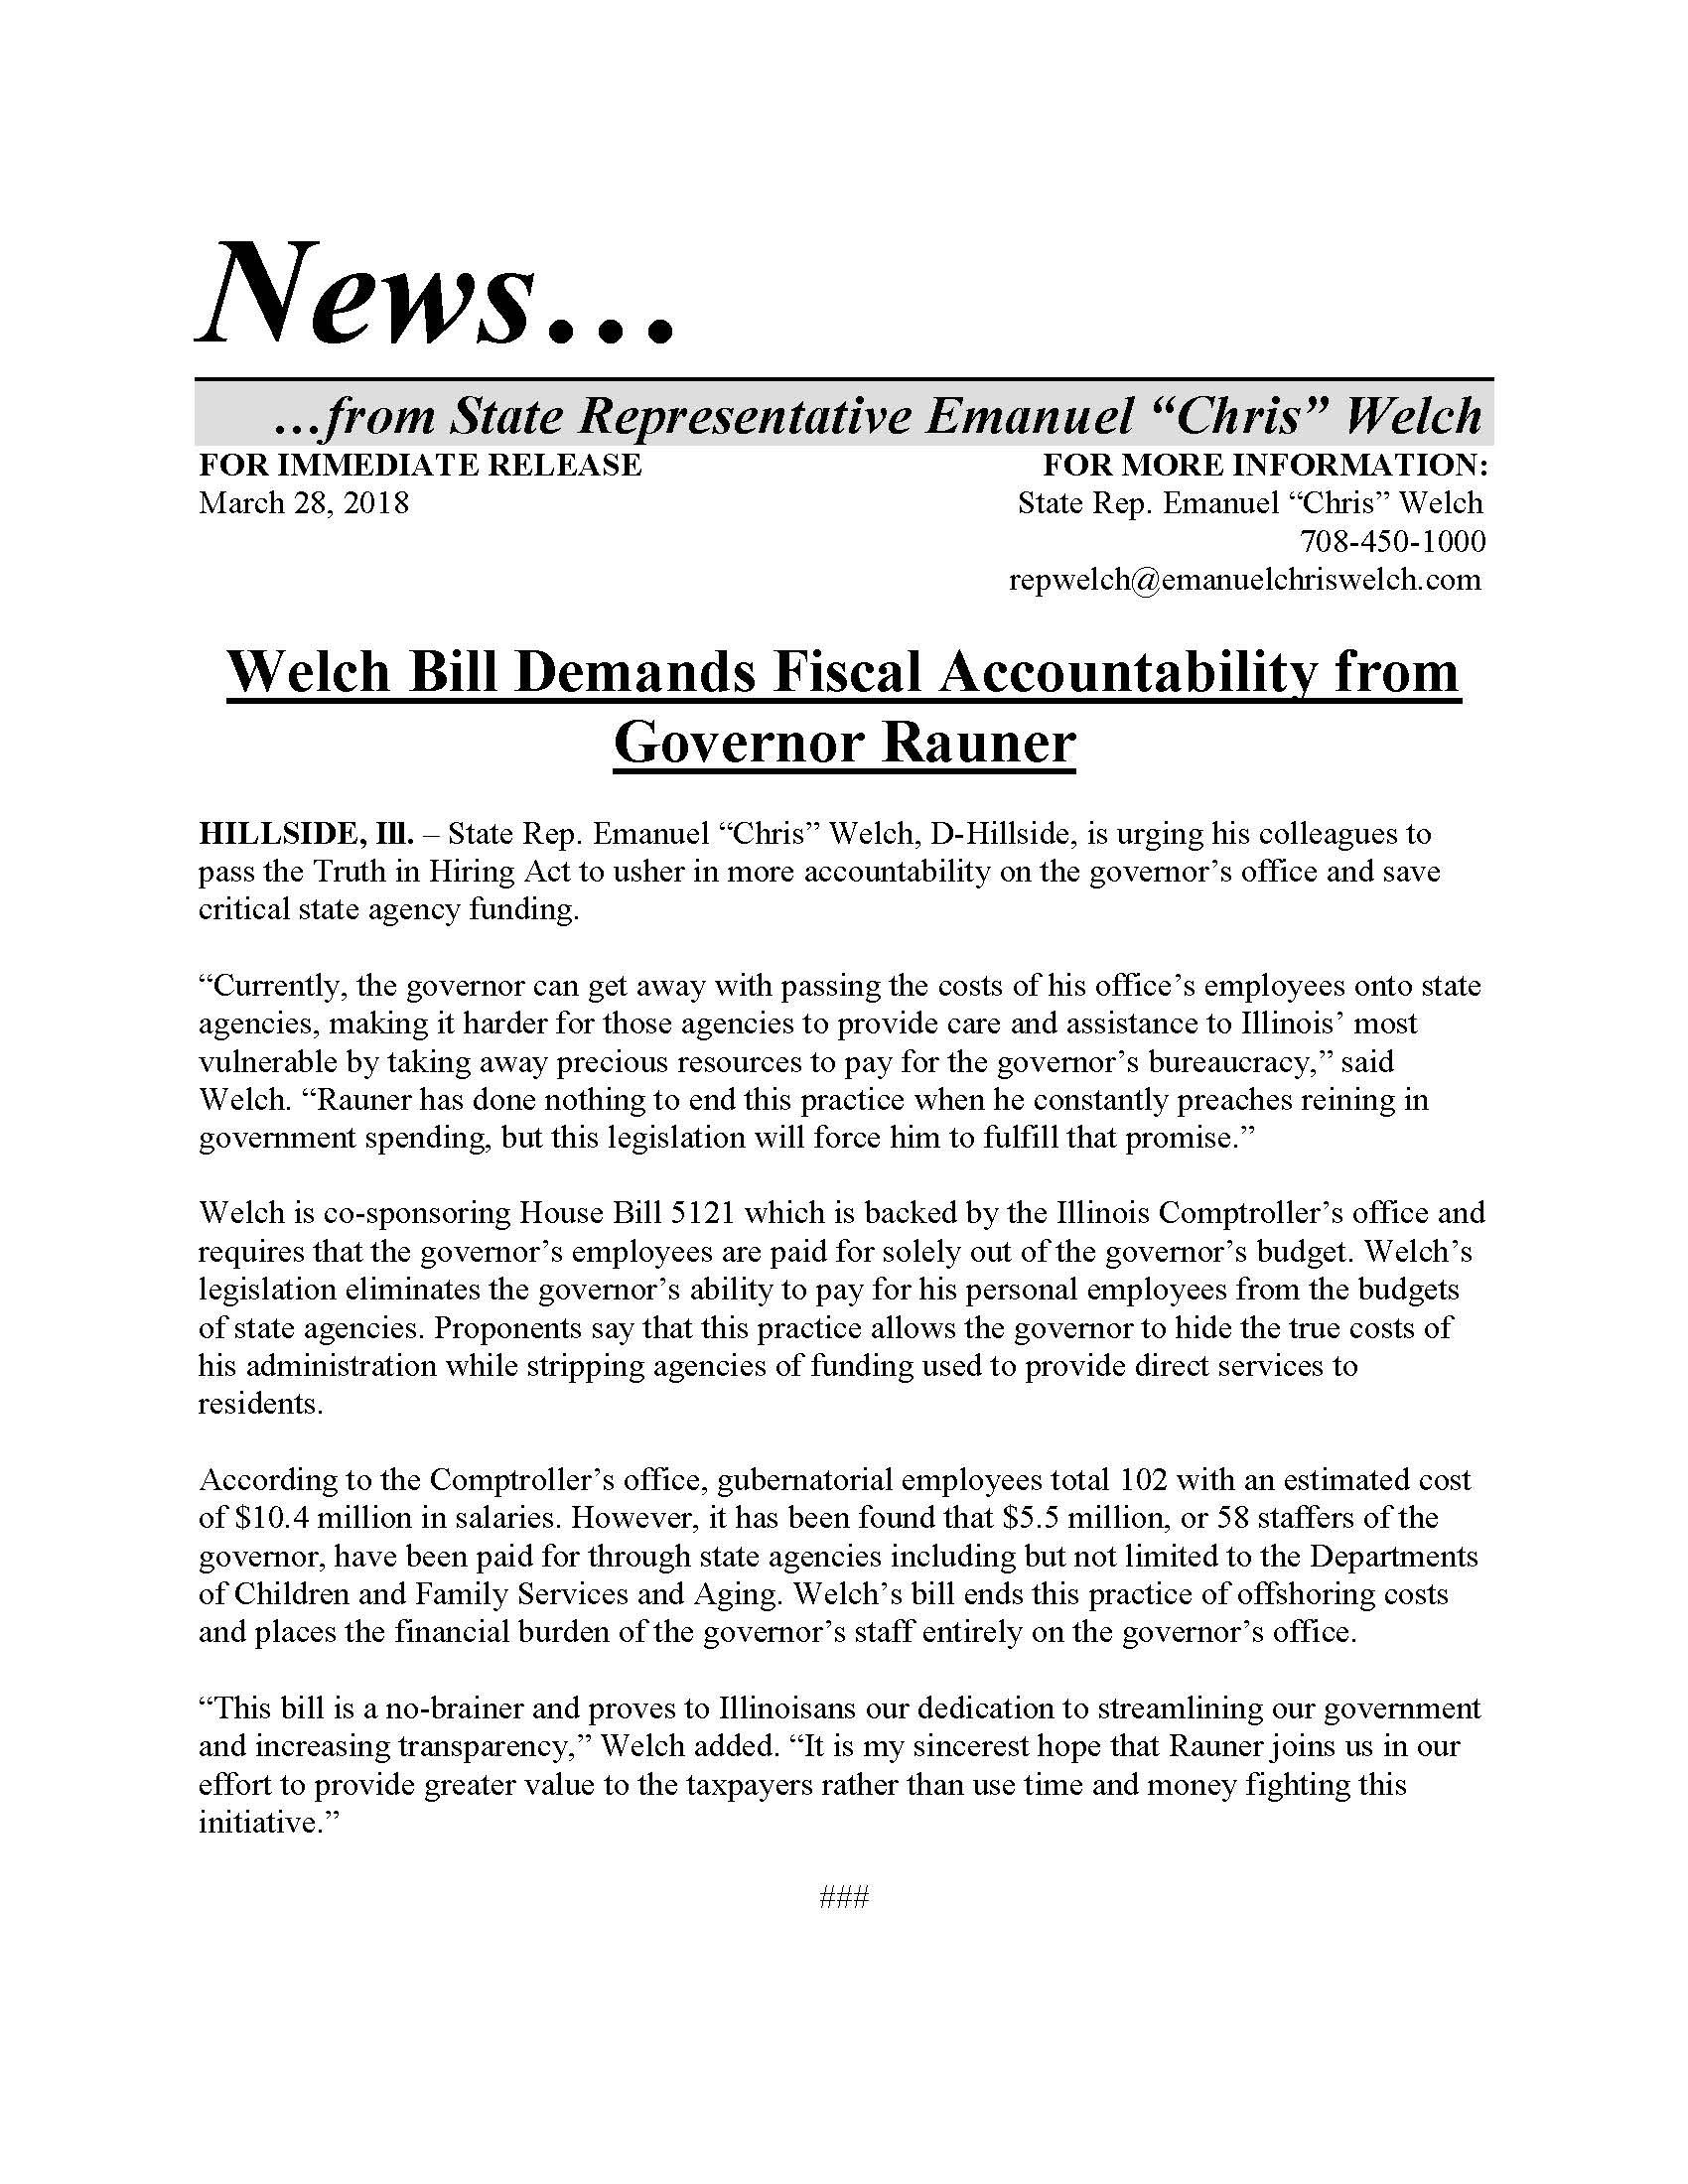 Welch Bill Demands Fiscal Accountability  (March 28, 2018)